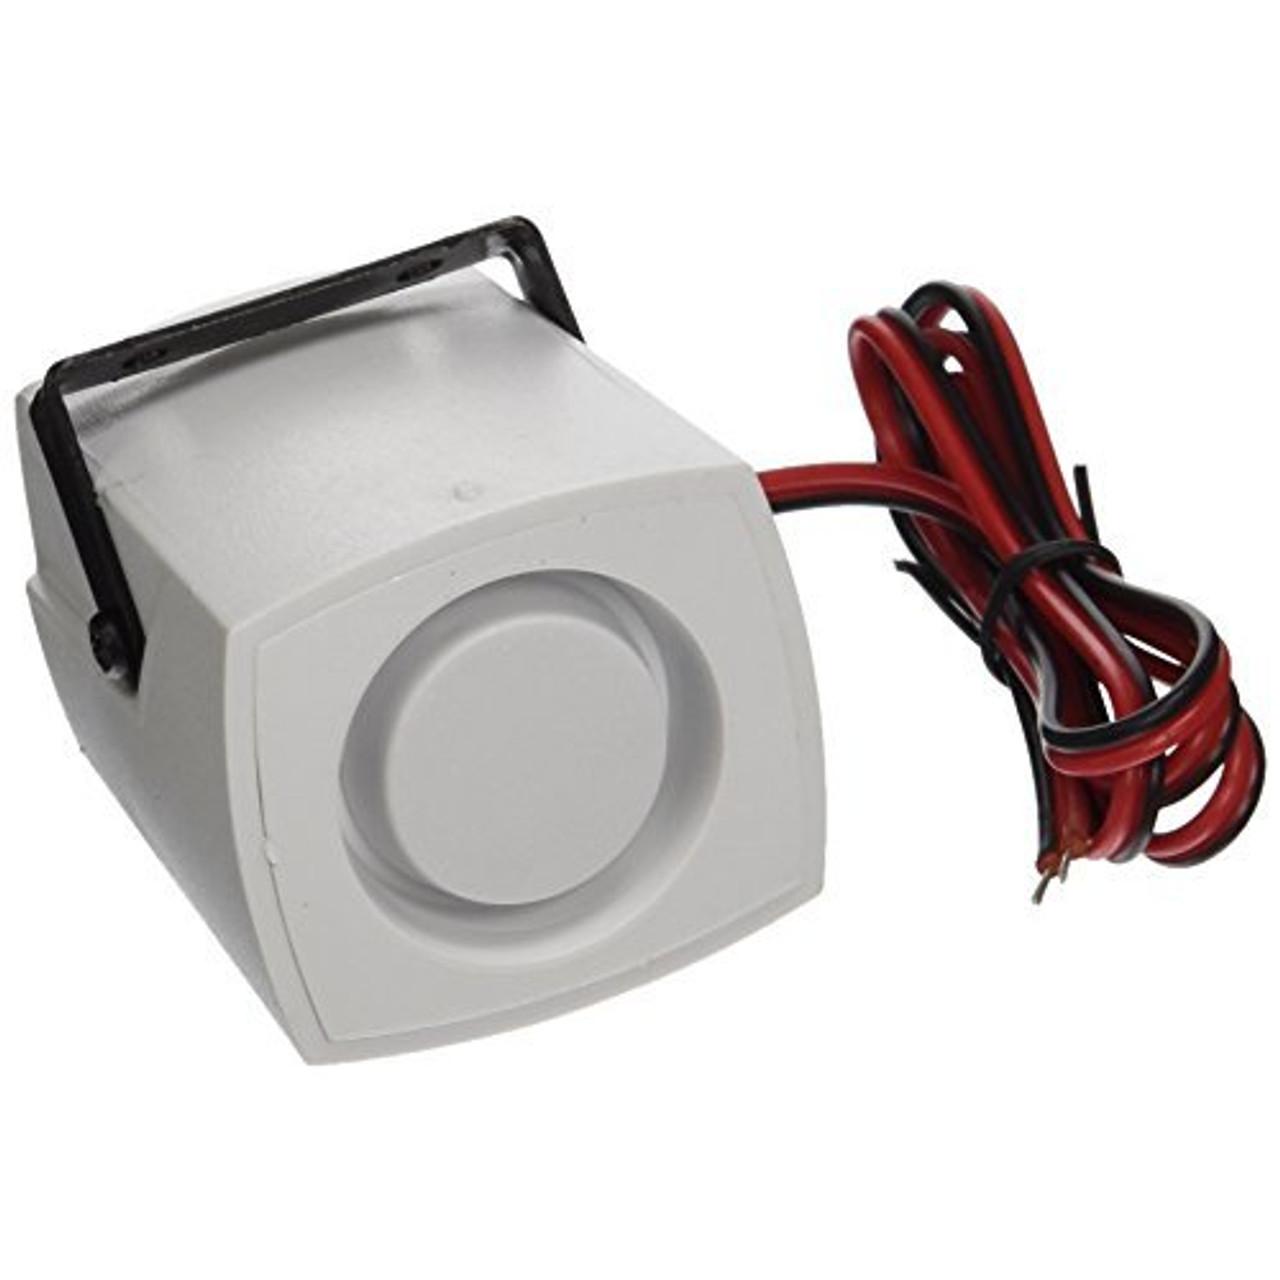 Standard Motor Products HP4740 handypack Headlight Socket